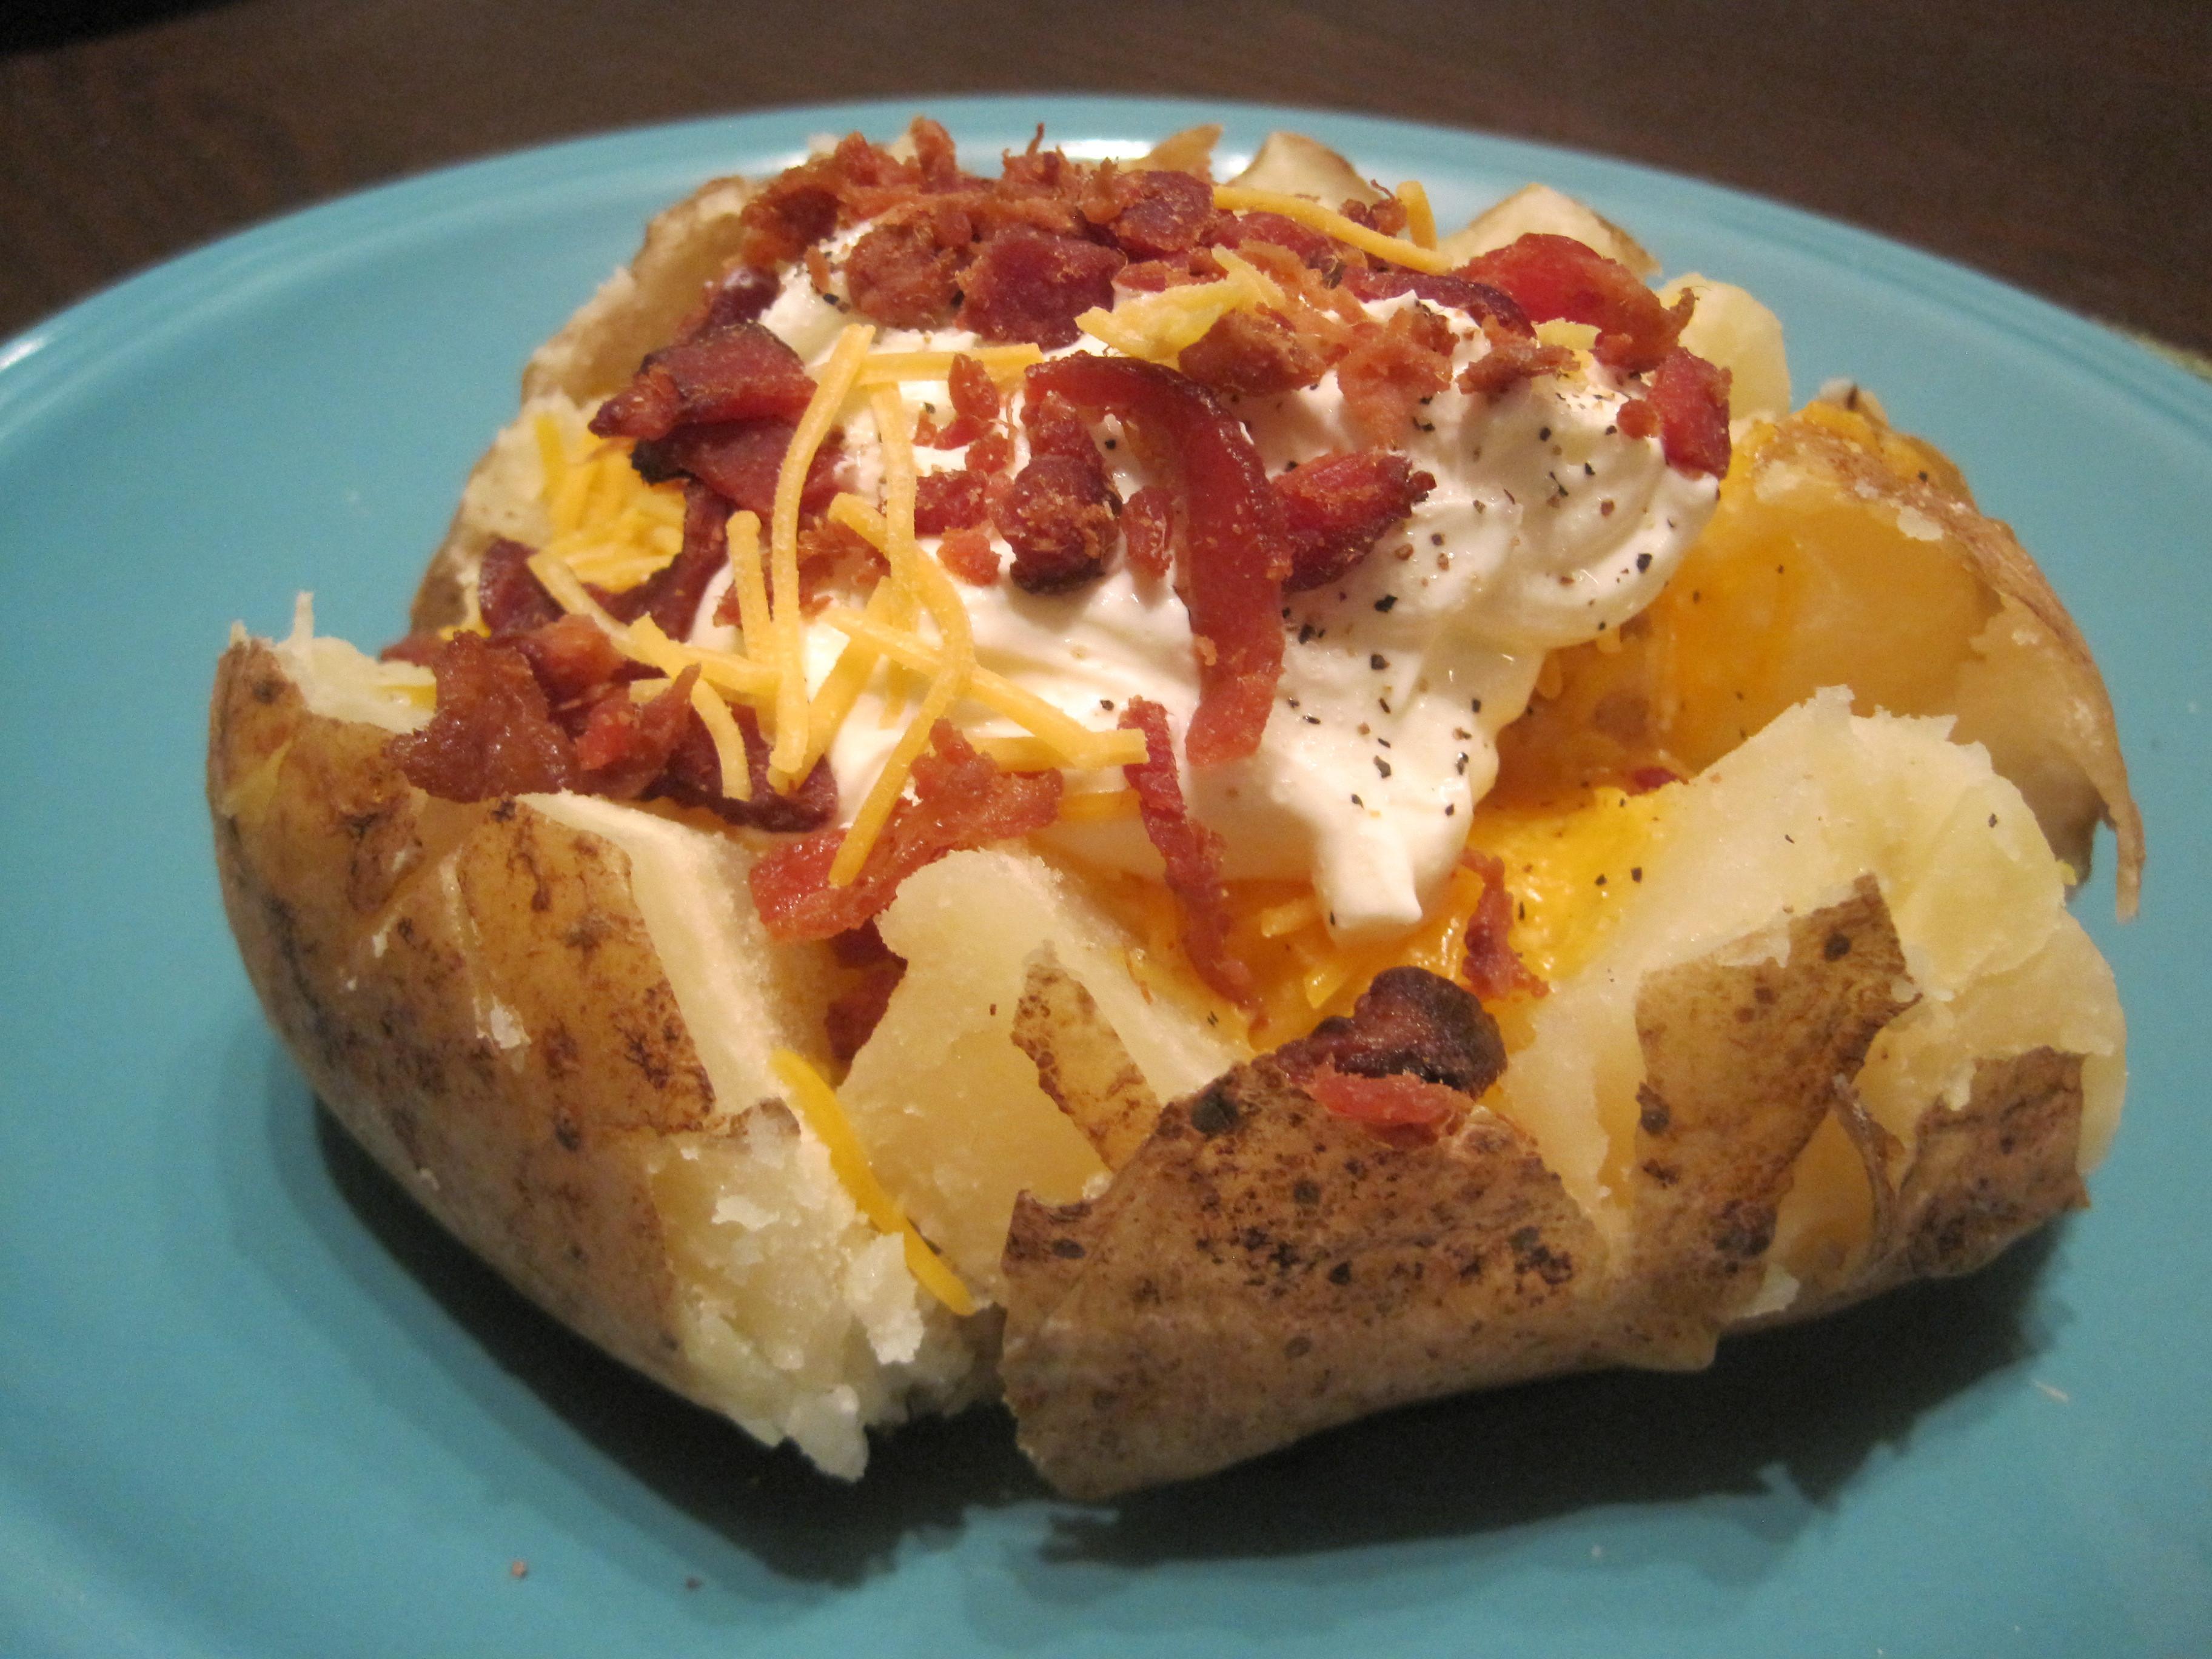 The Baked Potato  Good Potato Bad Potato and the Easy Baked Potato